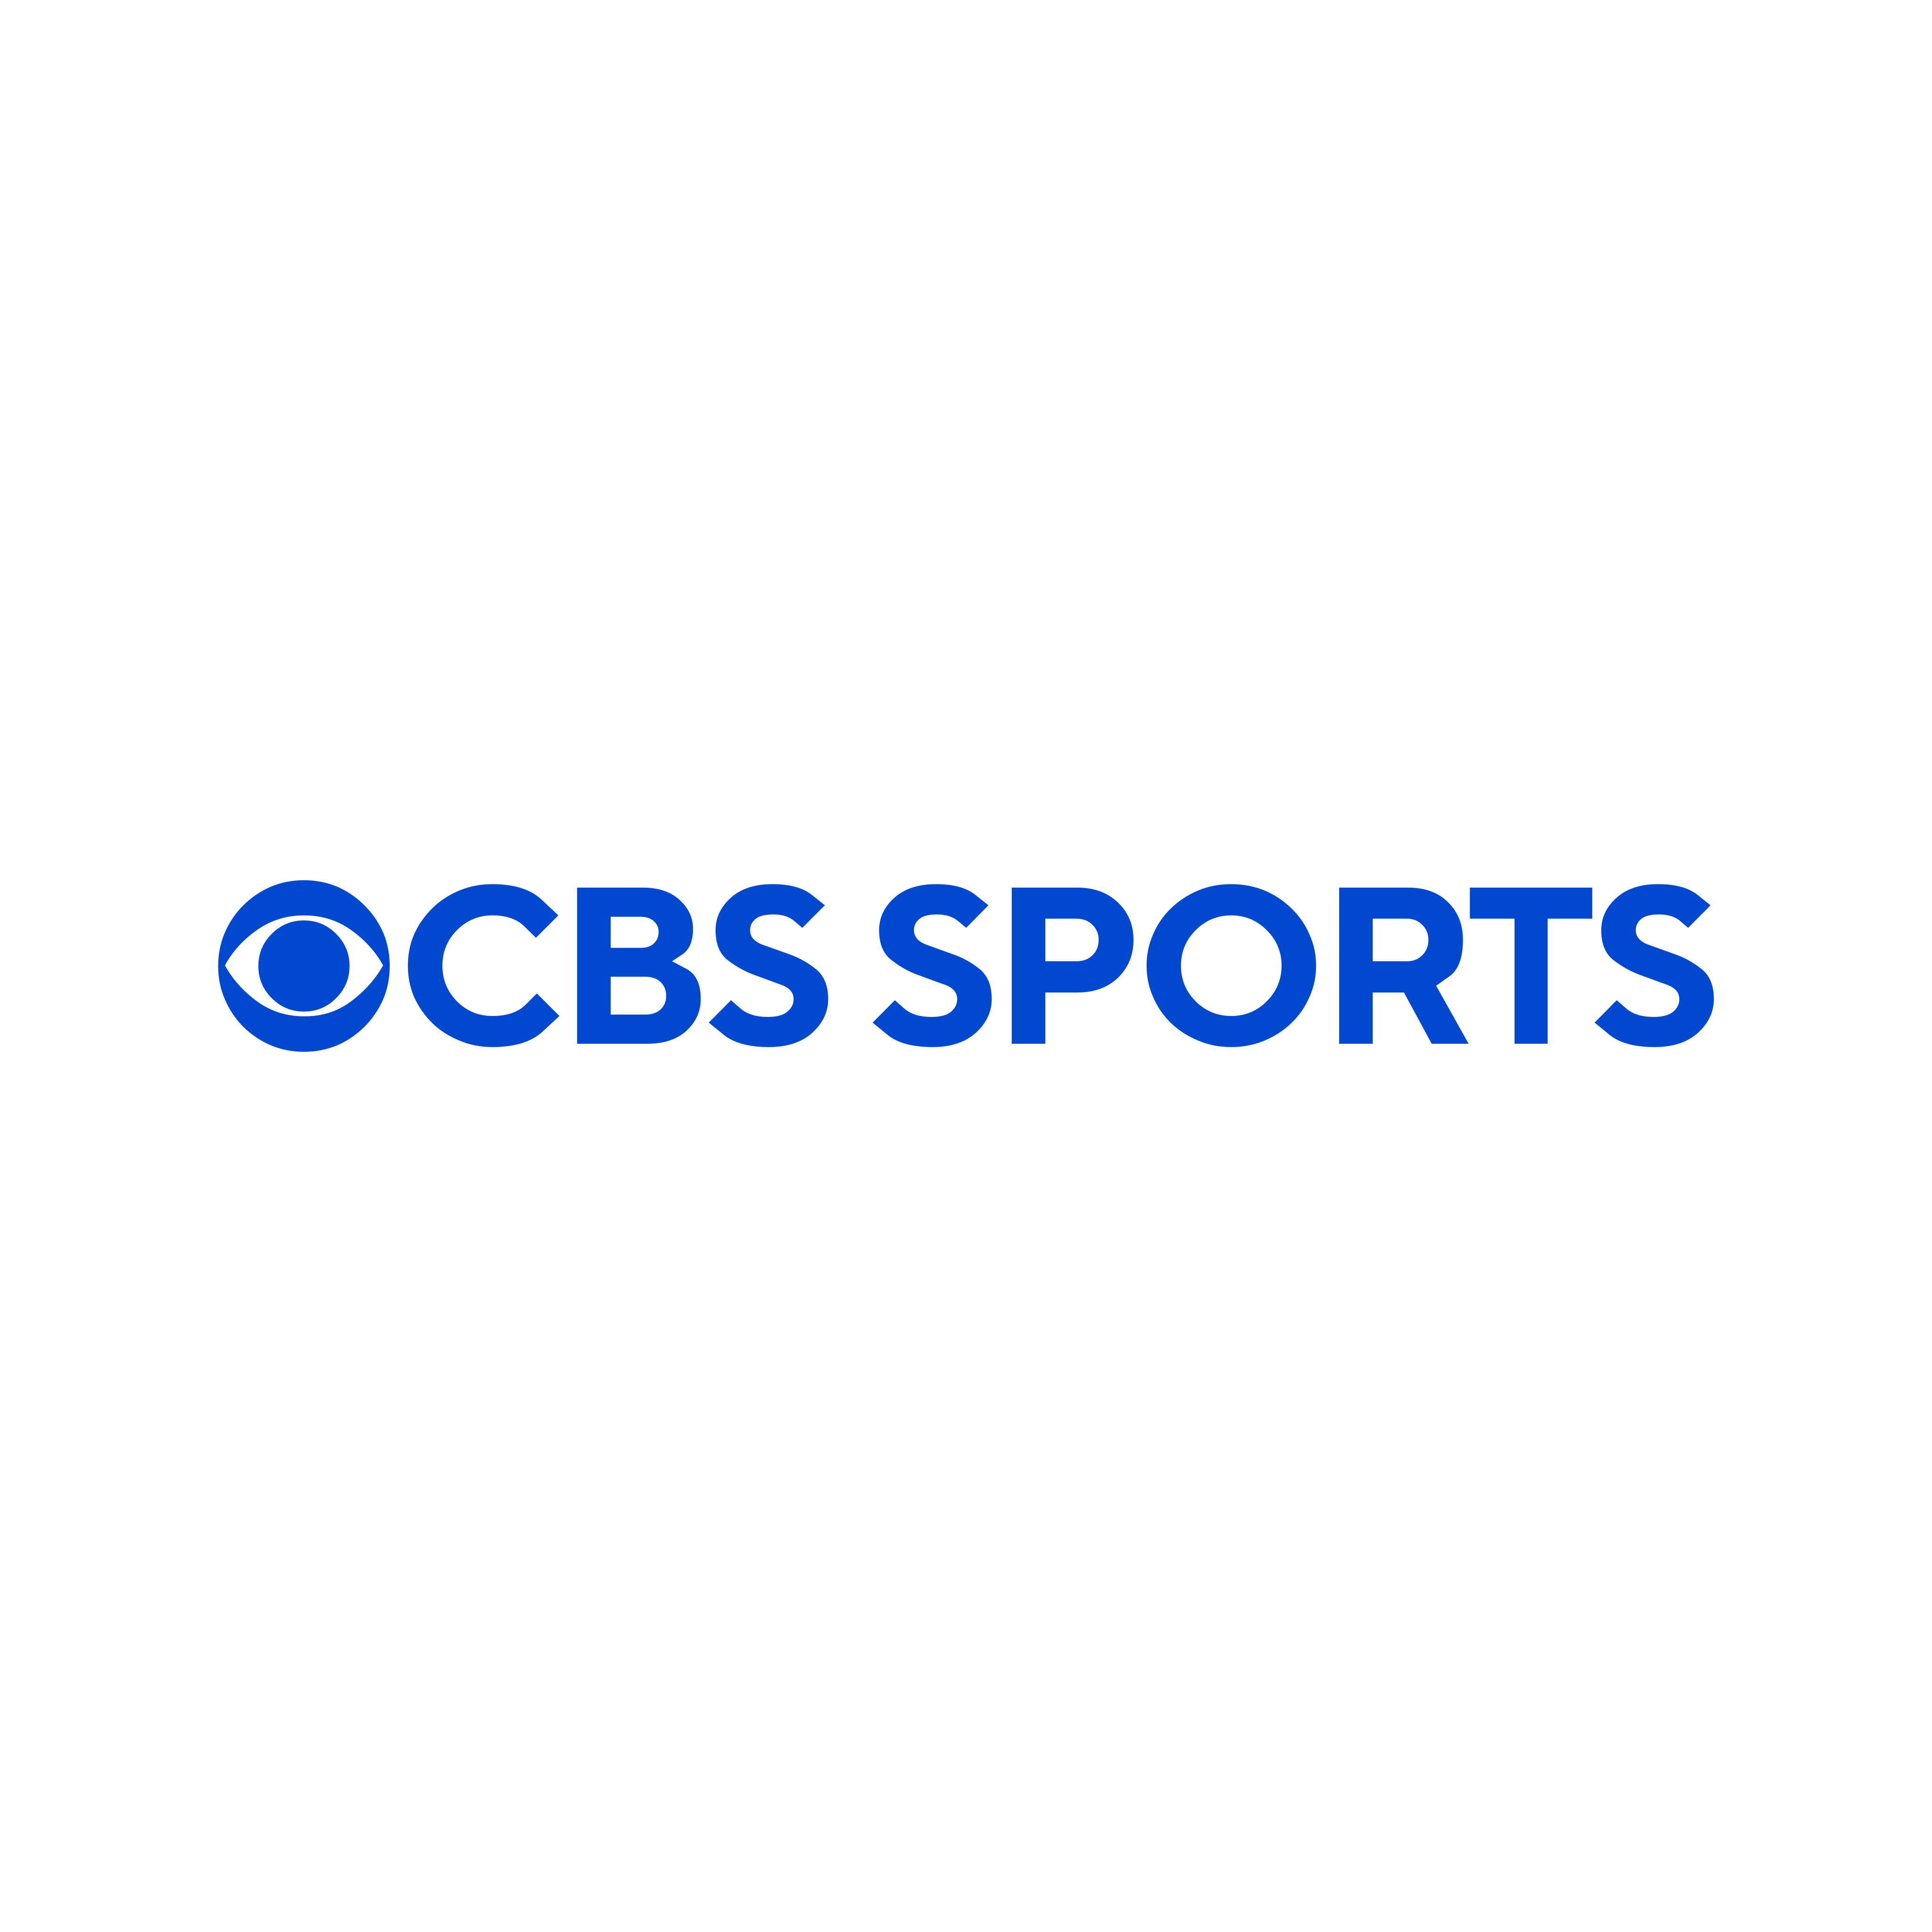 cbs sports logo 0 - CBS Sports Logo